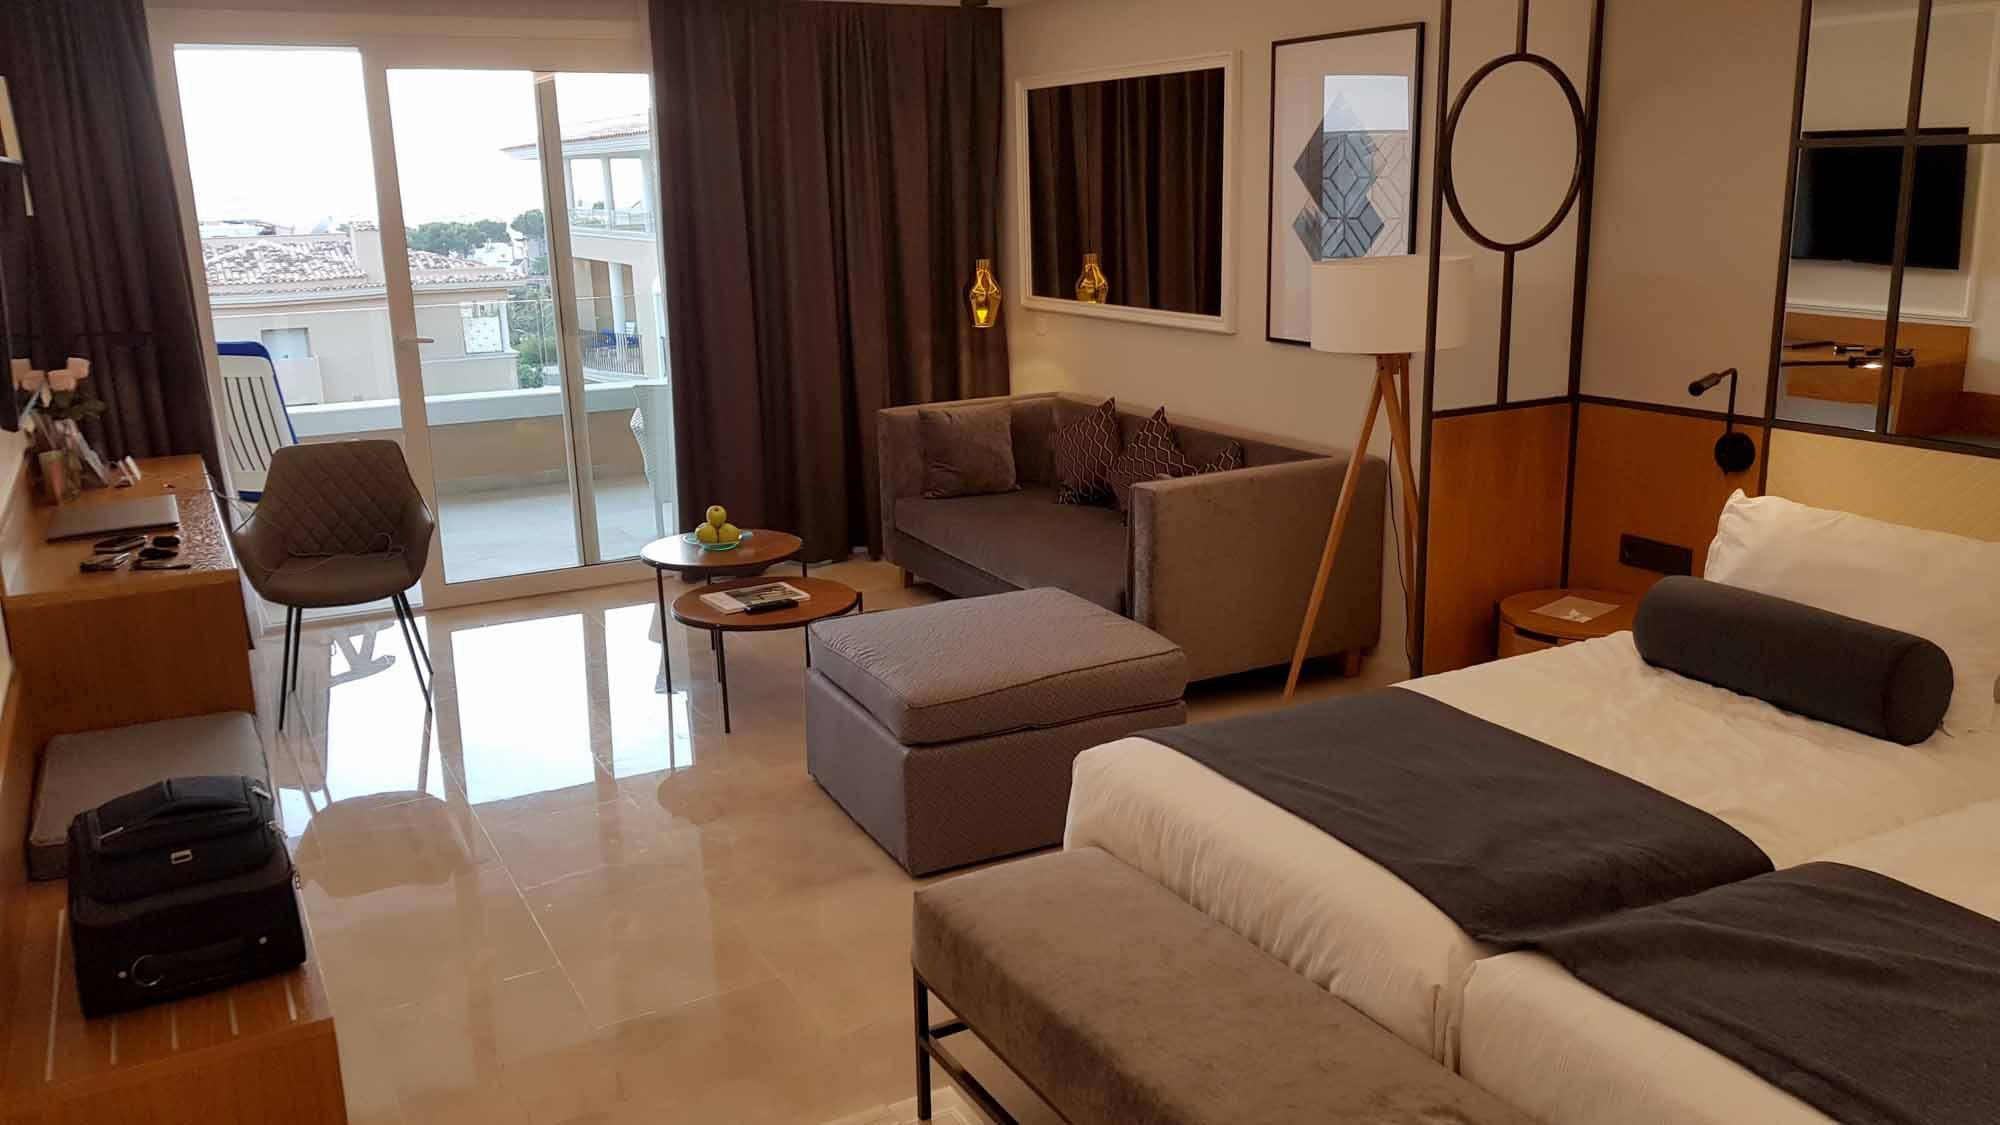 Großzügige Zimmer im Grupotel Playa de Palma Prestige Suites & Spa. / Foto: Joshua Donath